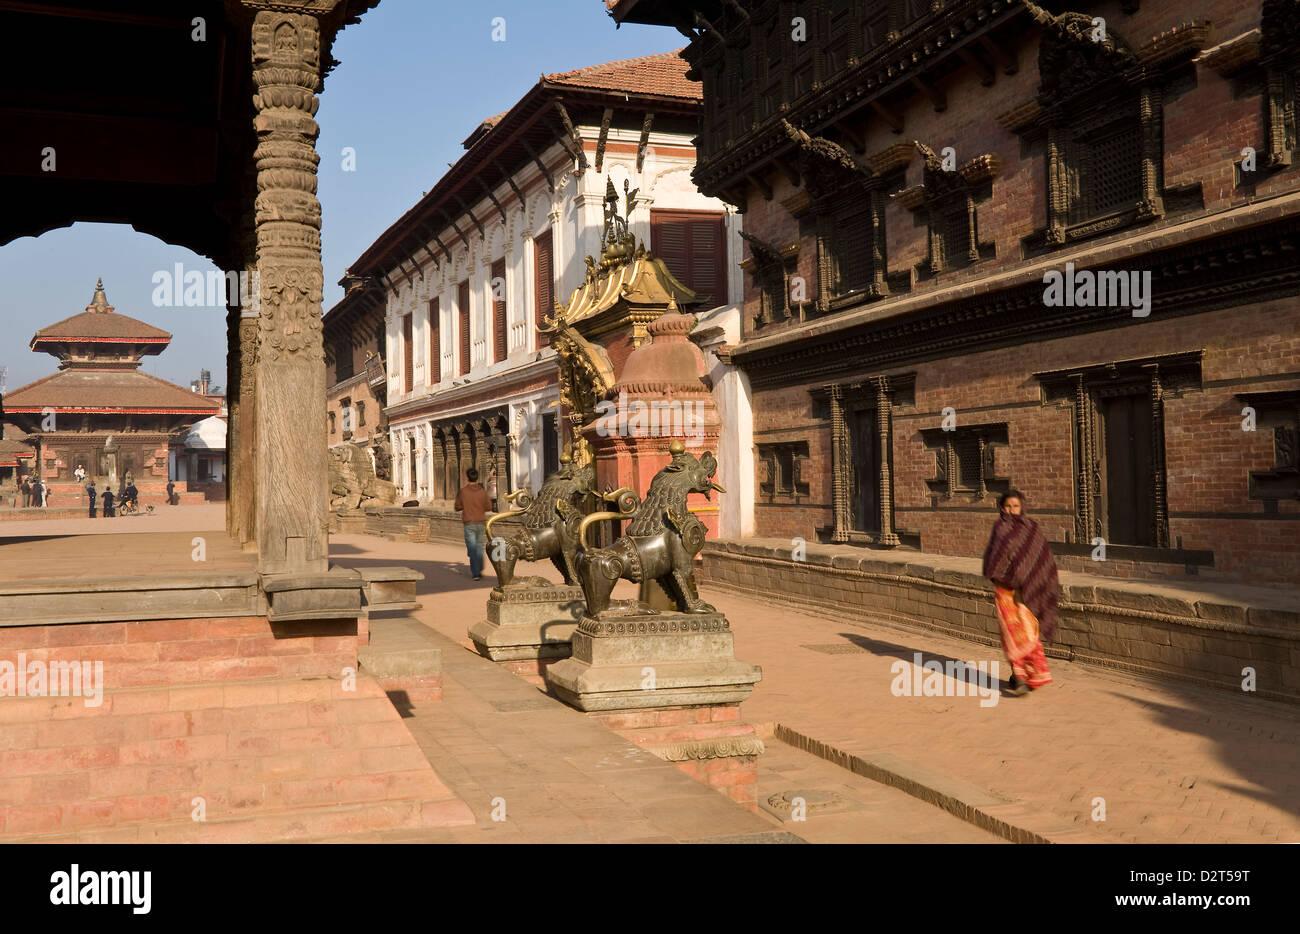 Durbar Square, Bhaktapur, UNESCO World Heritage Site, Kathmandu Valley, Nepal, Asia - Stock Image